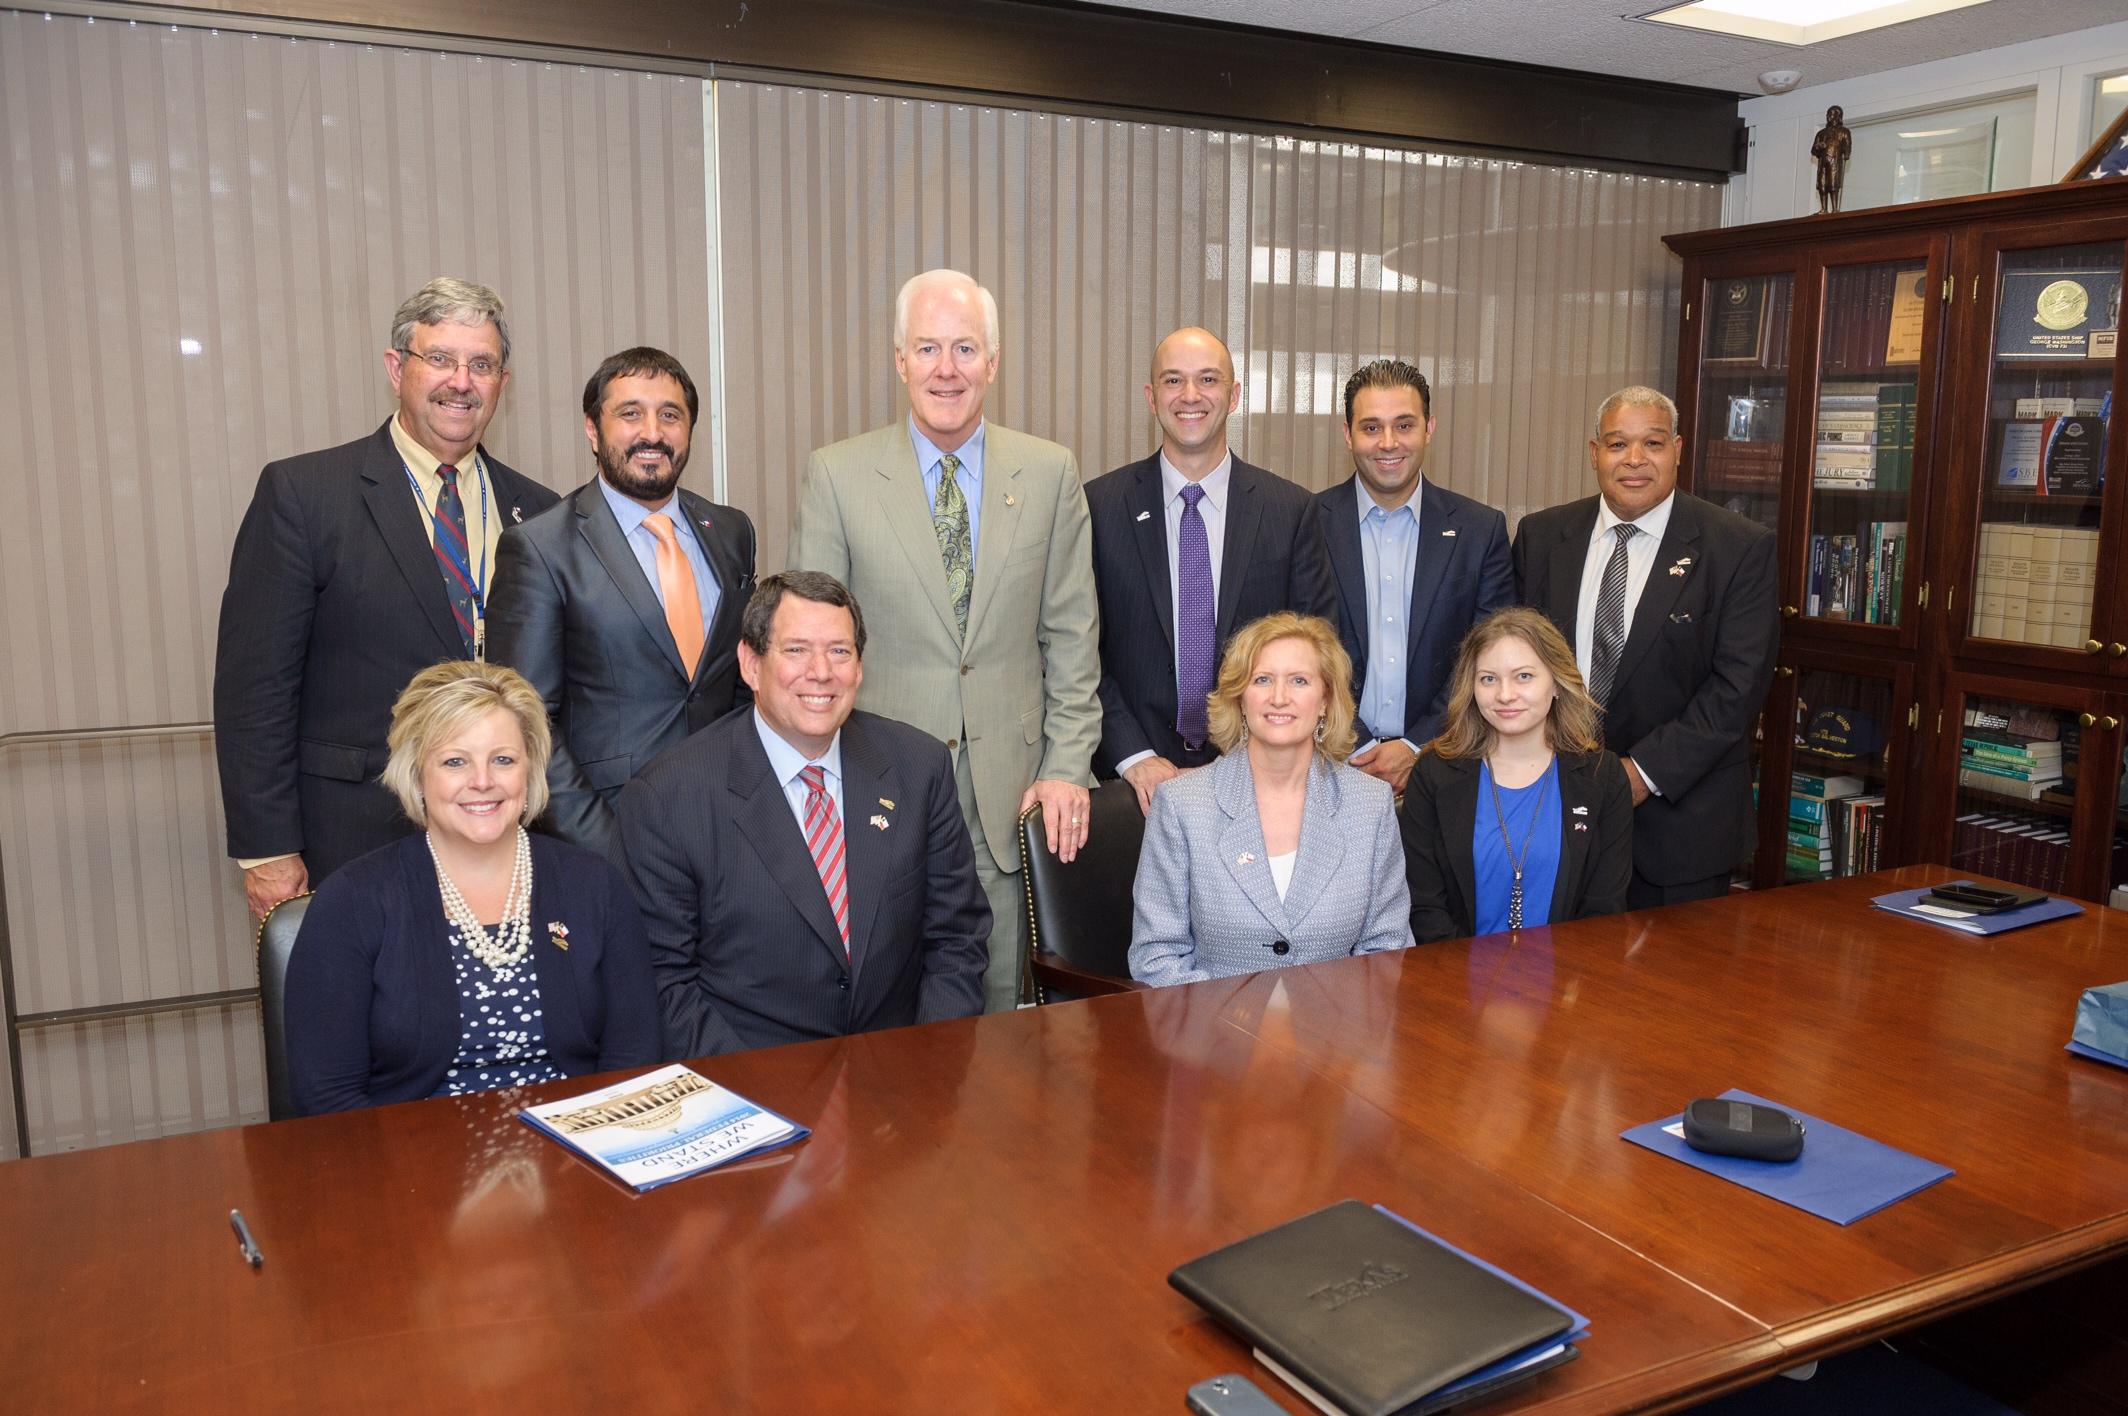 The Irving Delegation with U.S. Senator John Cornyn.